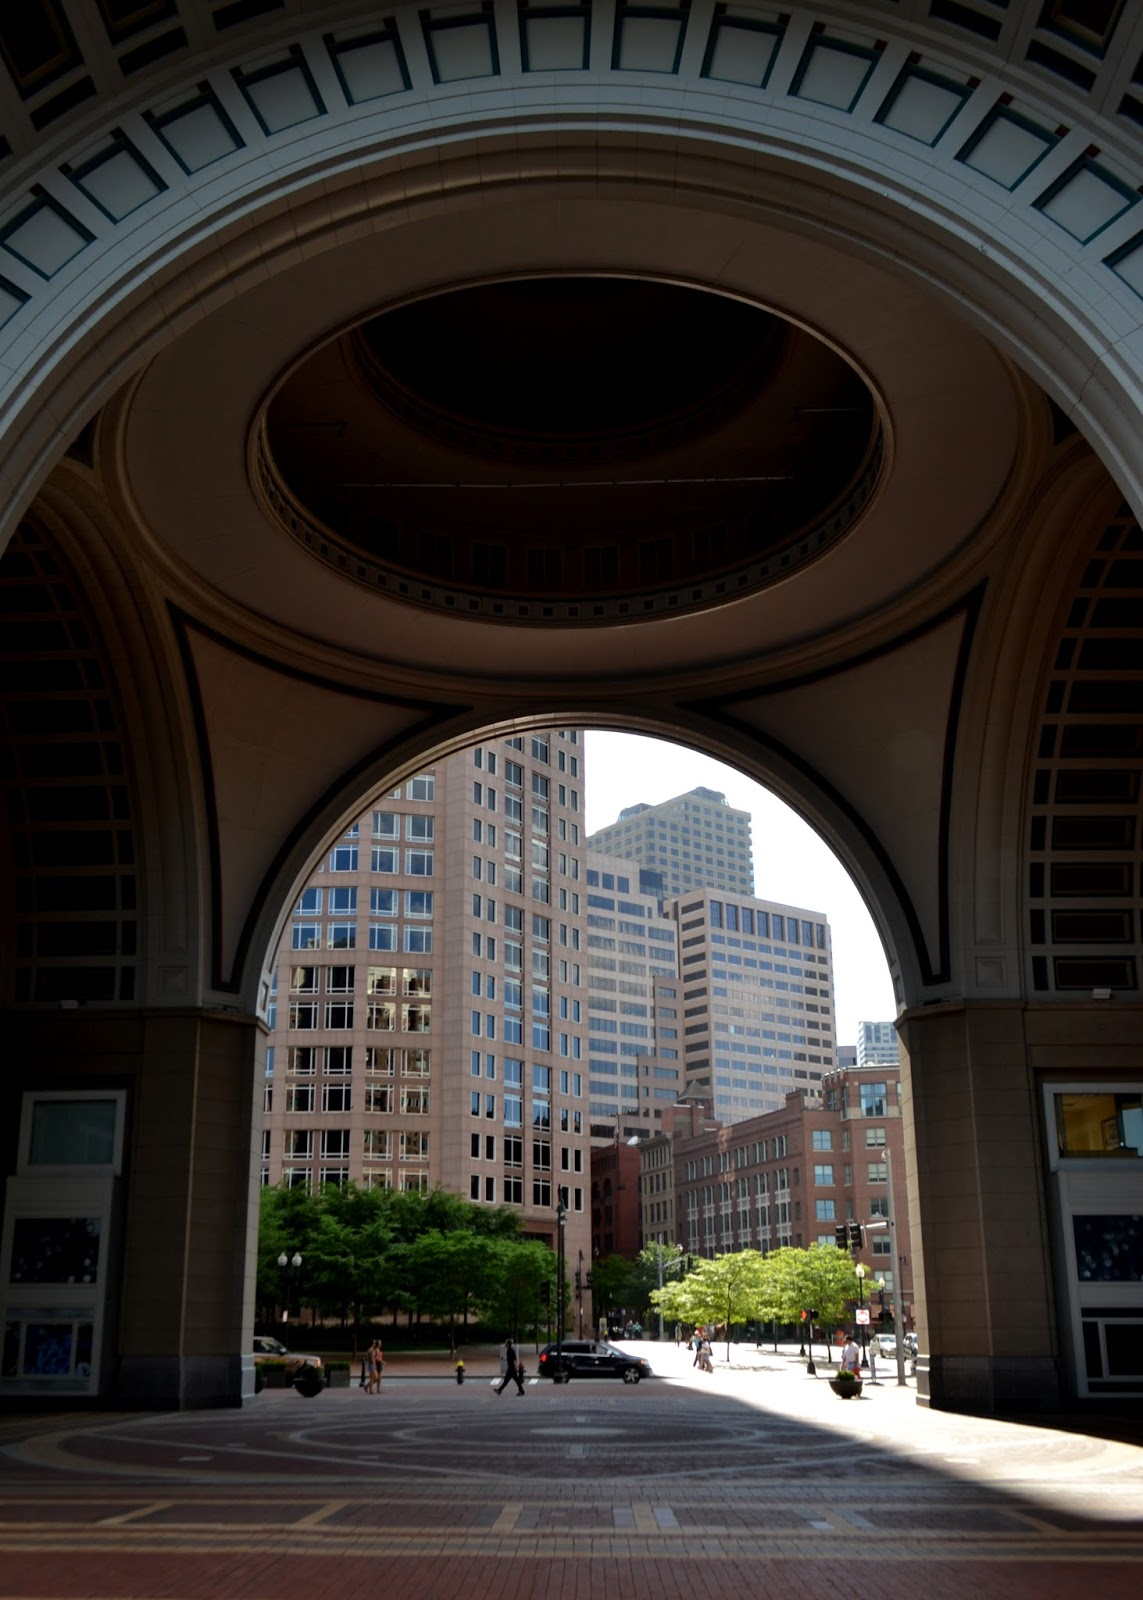 arch, rowes wharf, boston, shadow